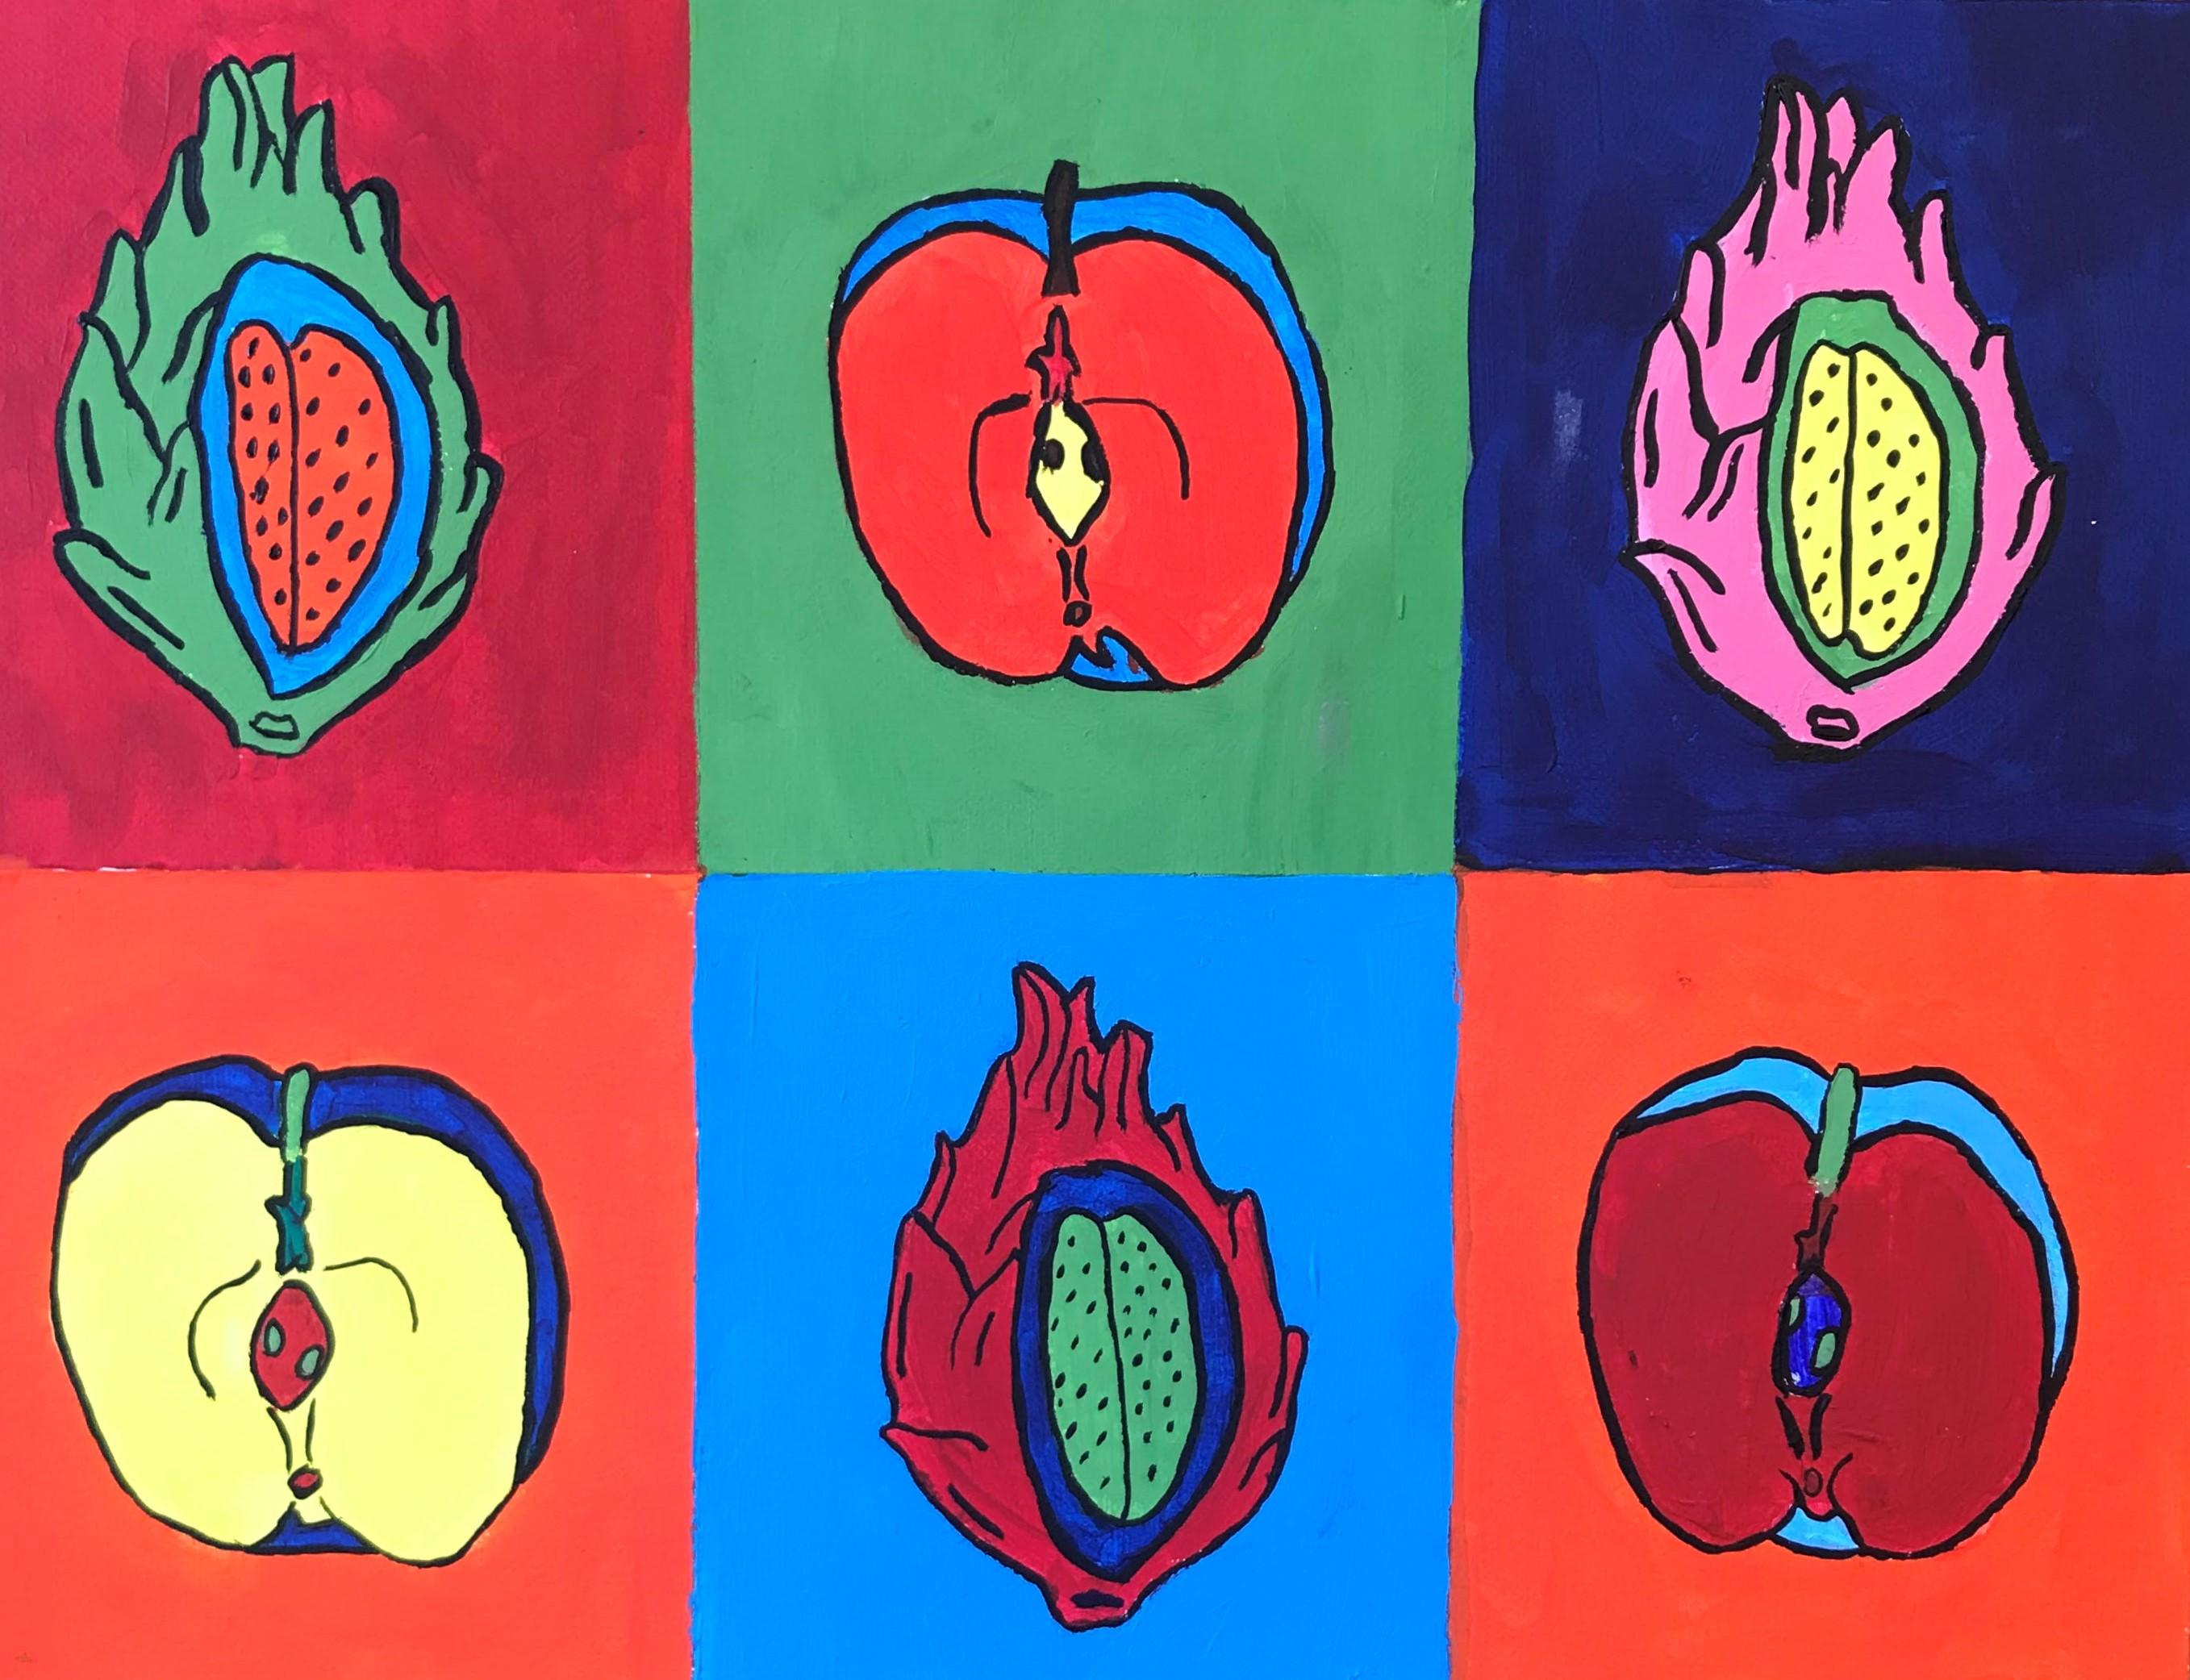 fruit saladIsobelle Wilebore